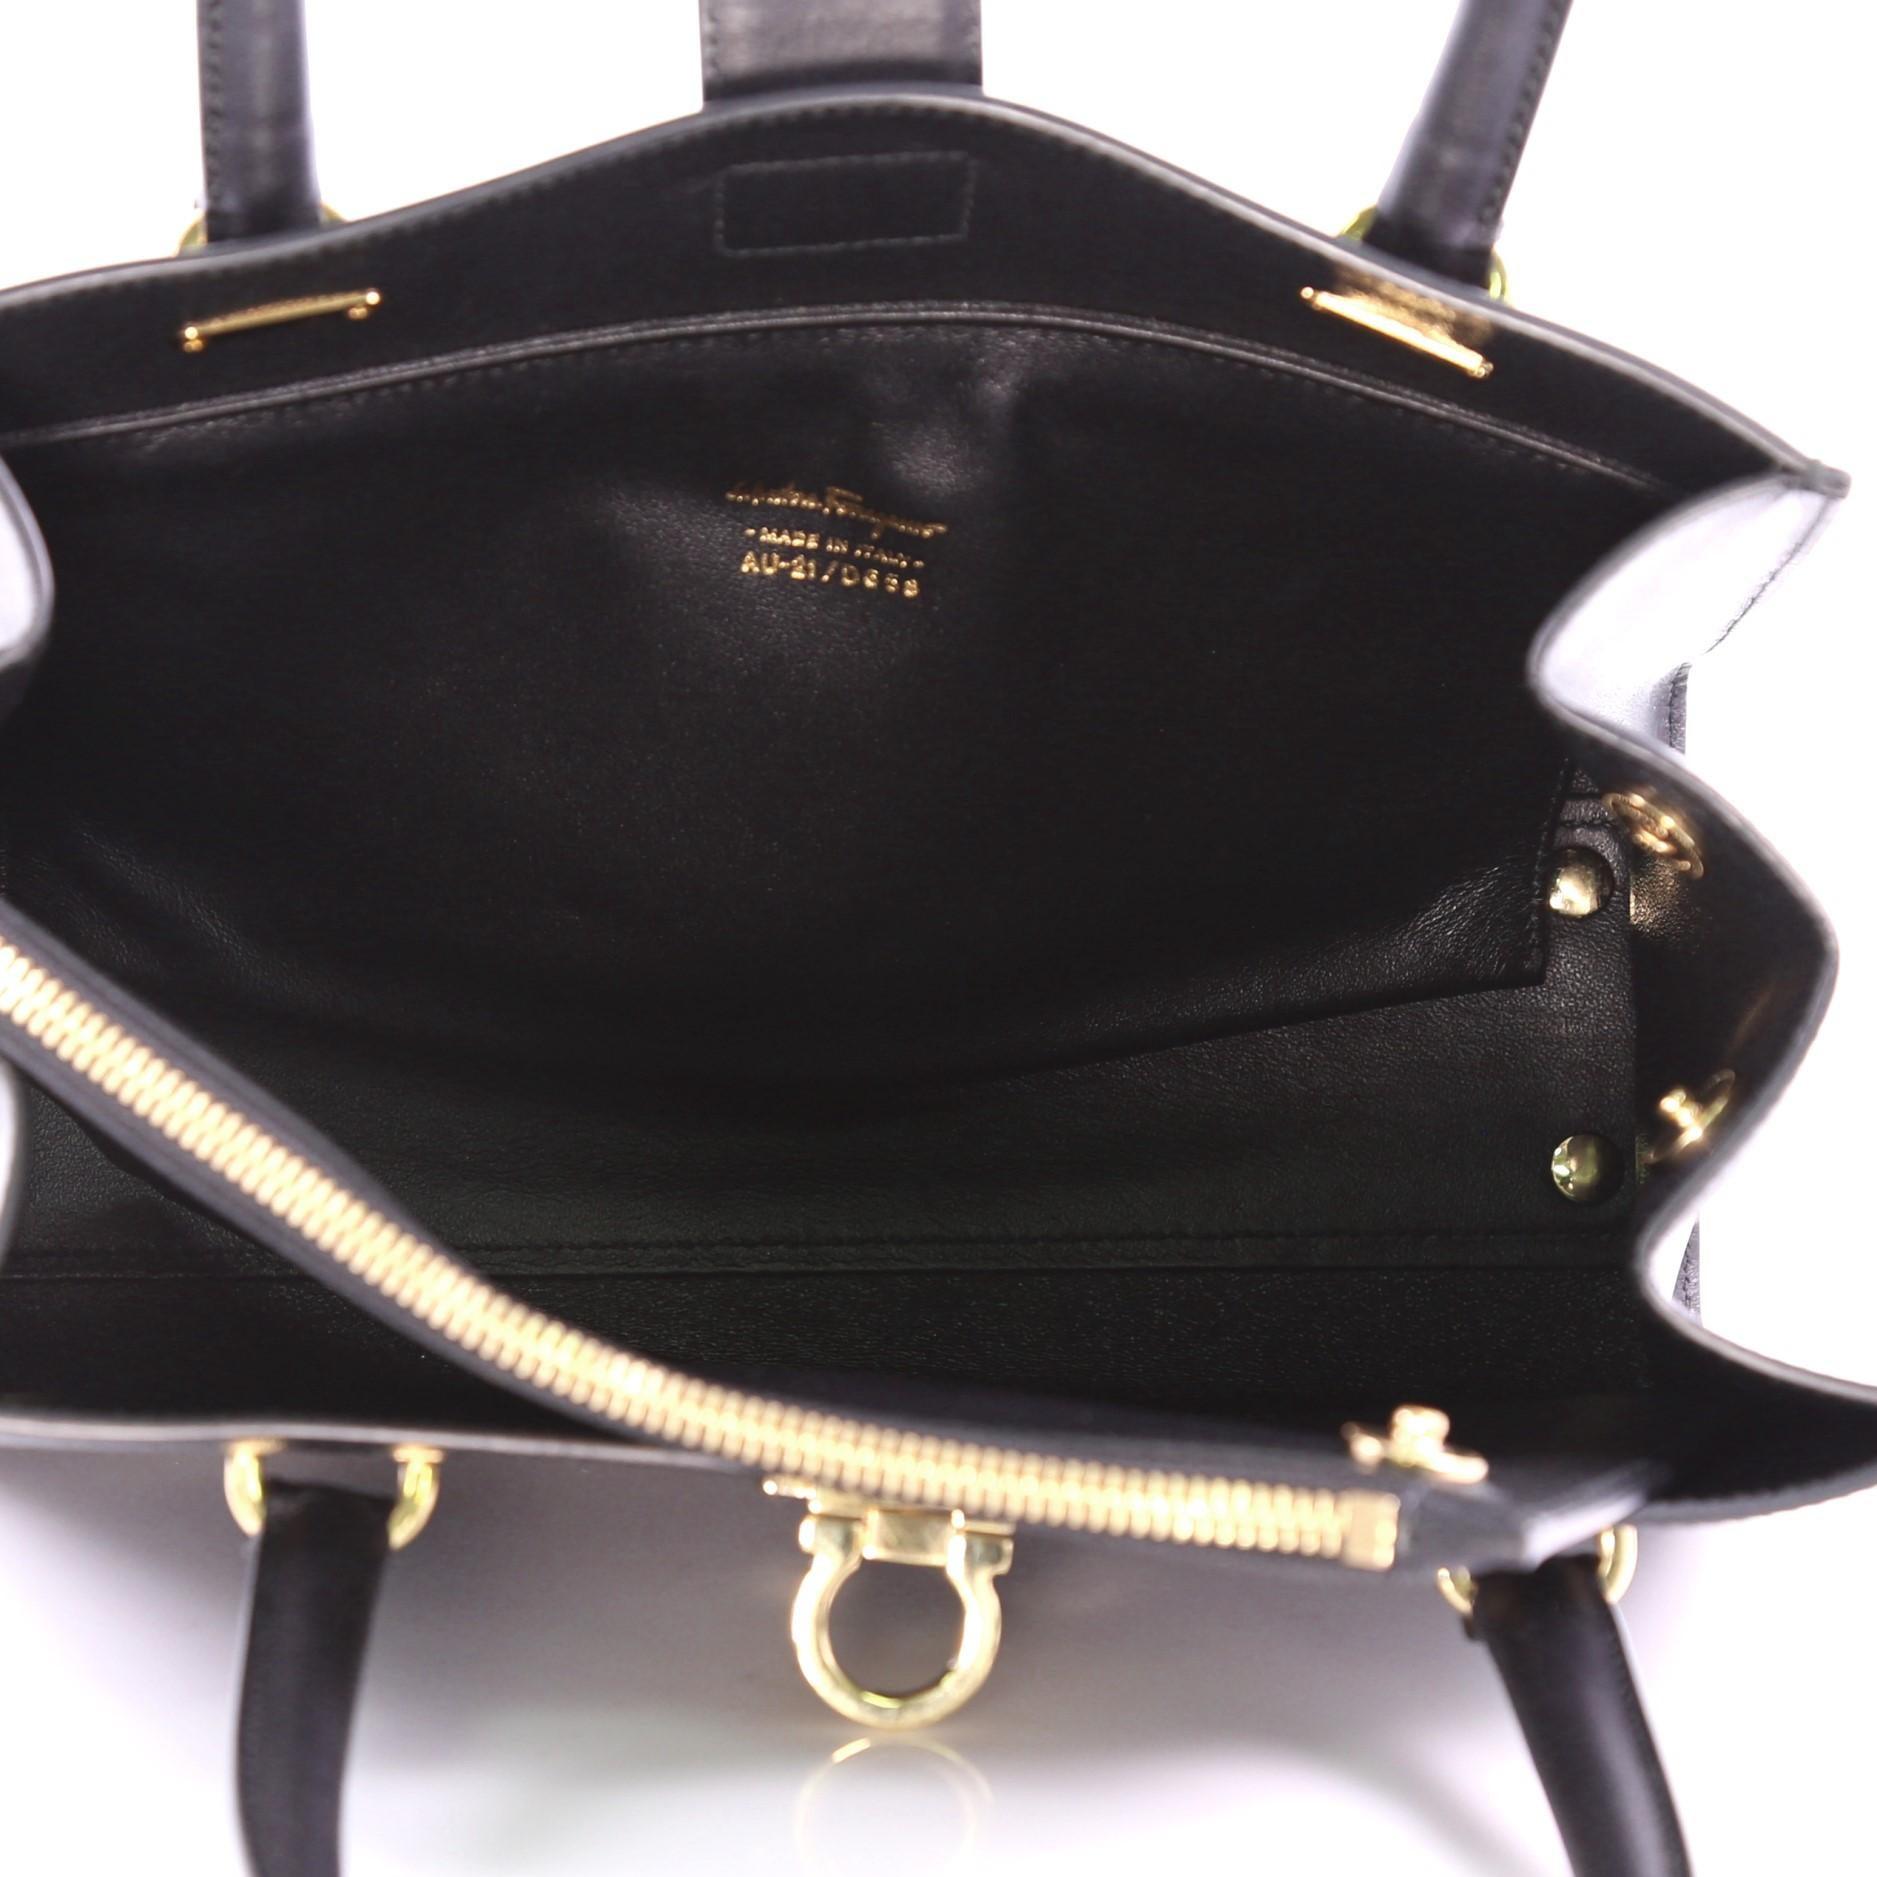 5994f6363e57 Salvatore Ferragamo Marlene Tote Leather Medium at 1stdibs